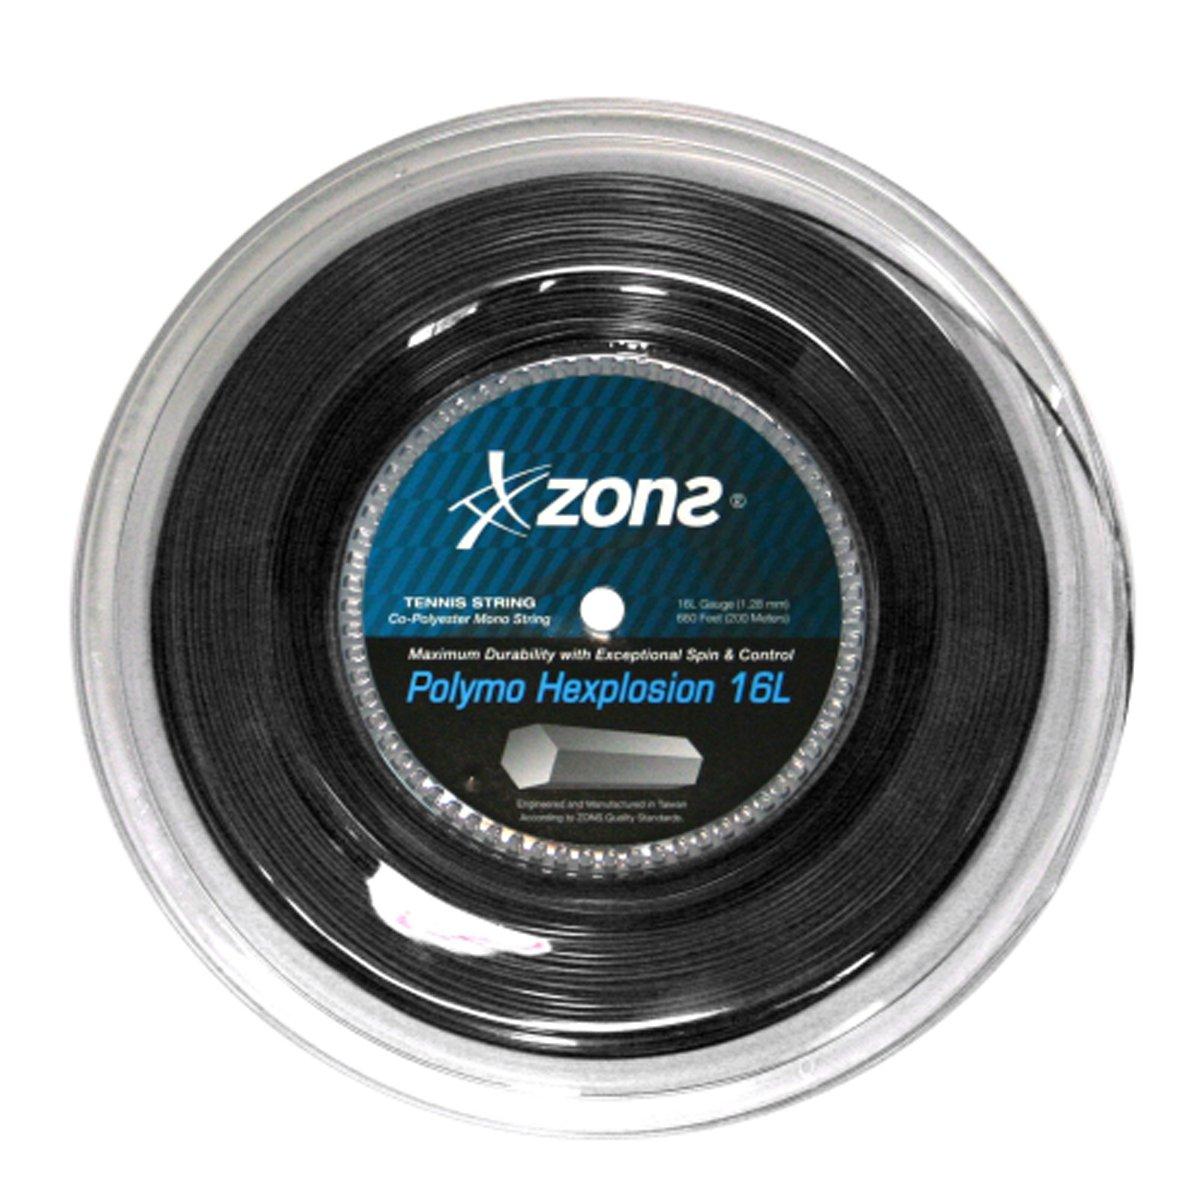 Corda Zons Hexplosion 16l 1.28mm - Rolo Com 200 Metros  - PROTENISTA